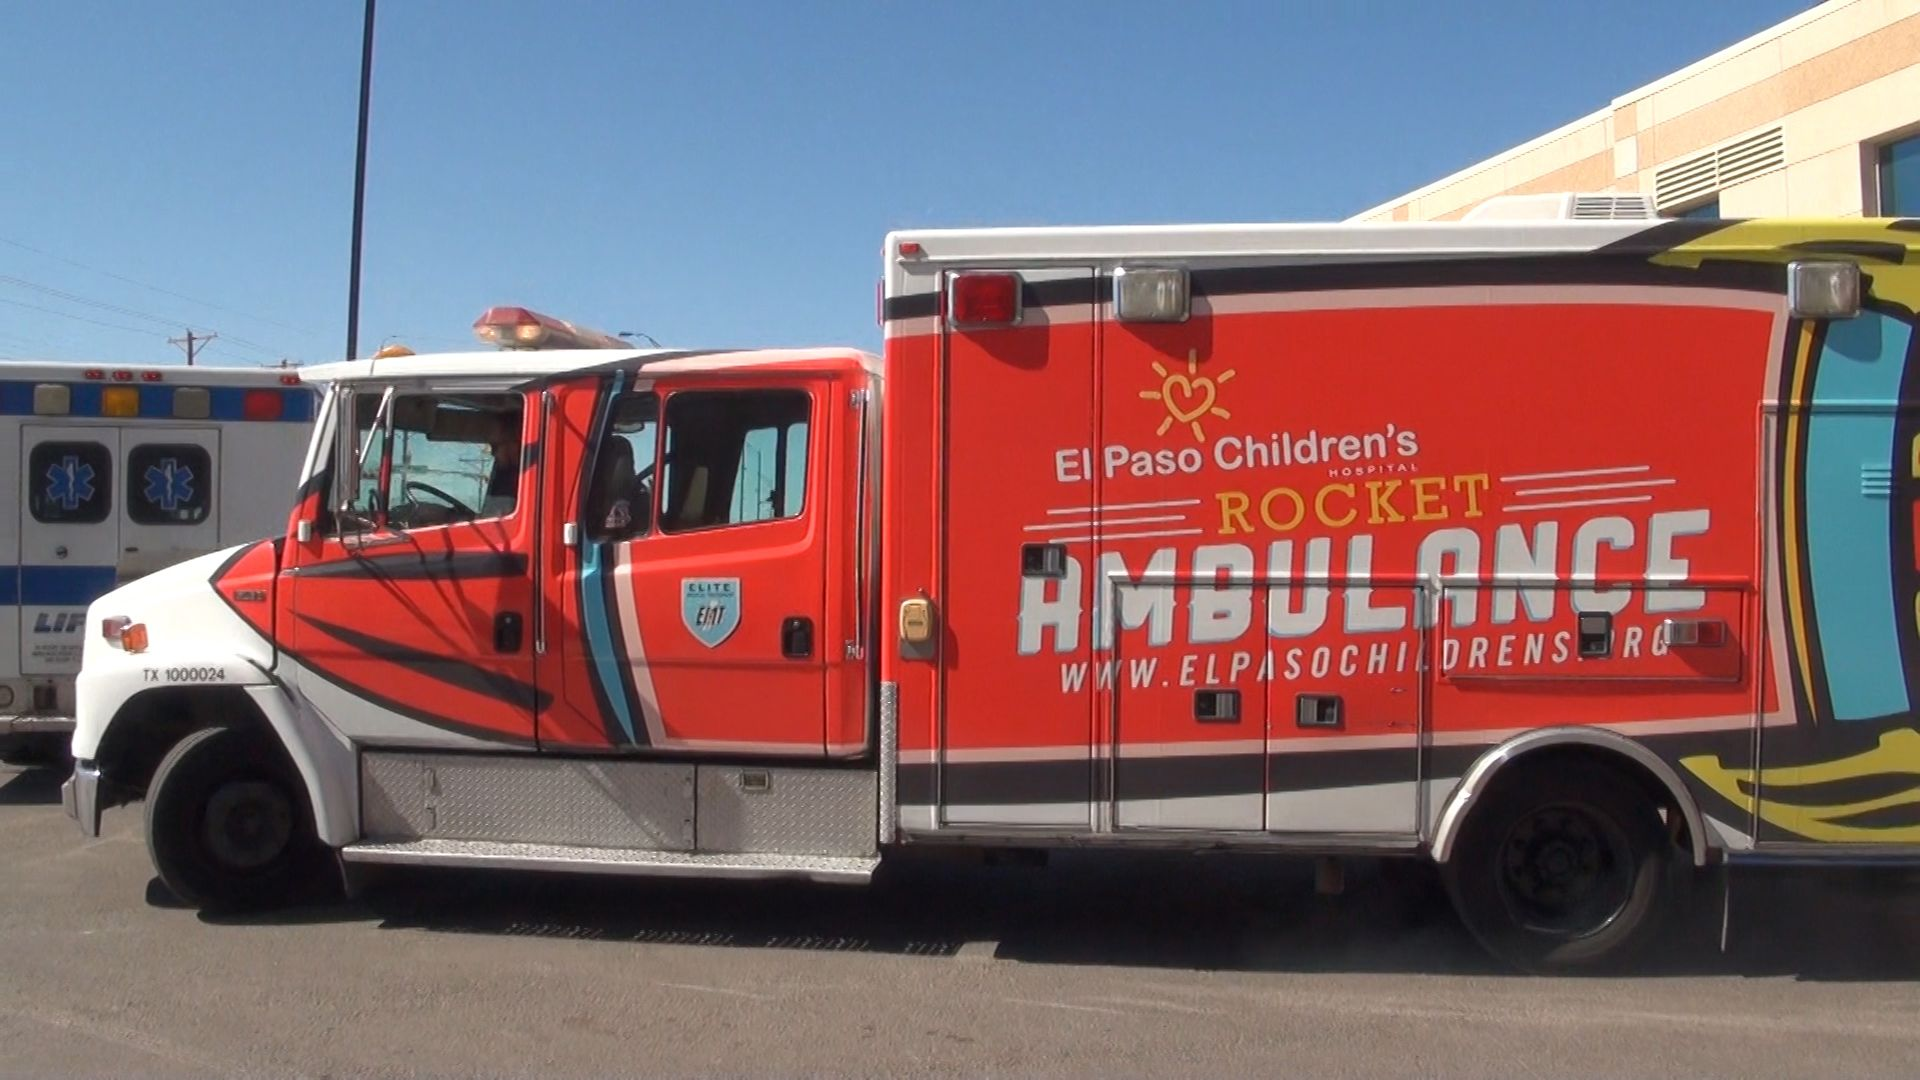 El Paso Children's Hospital Rocket Ambulance. To donate